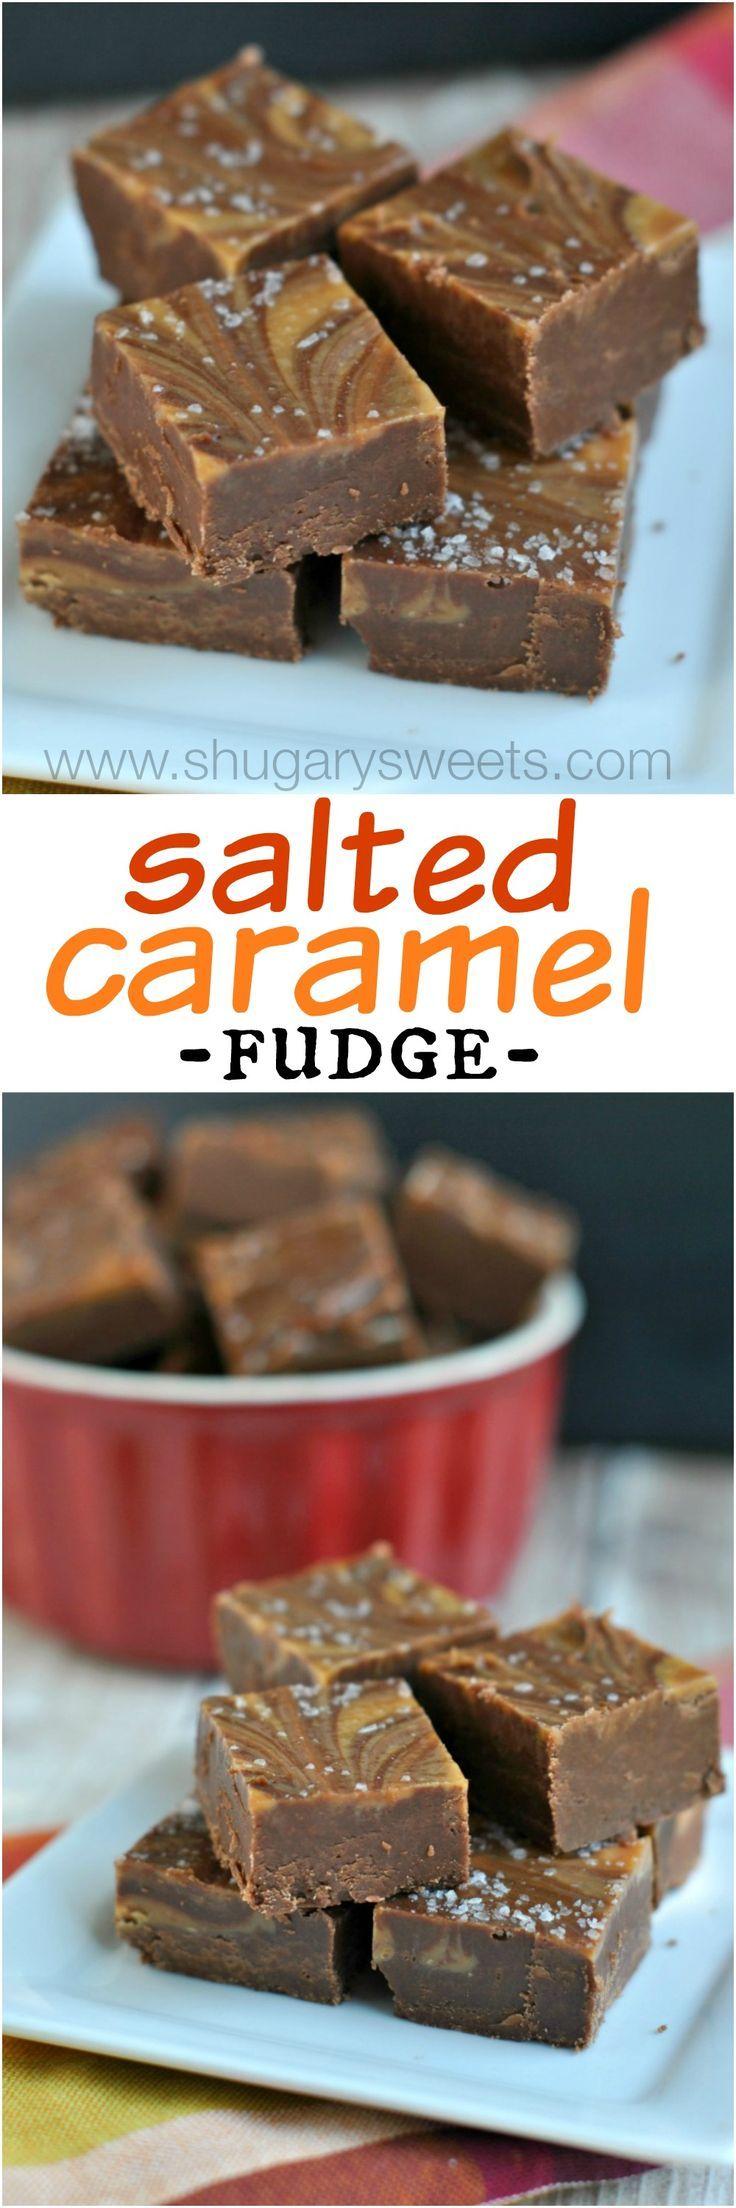 Salted Caramel Fudge Recipe                                                                                                                                                                                 More